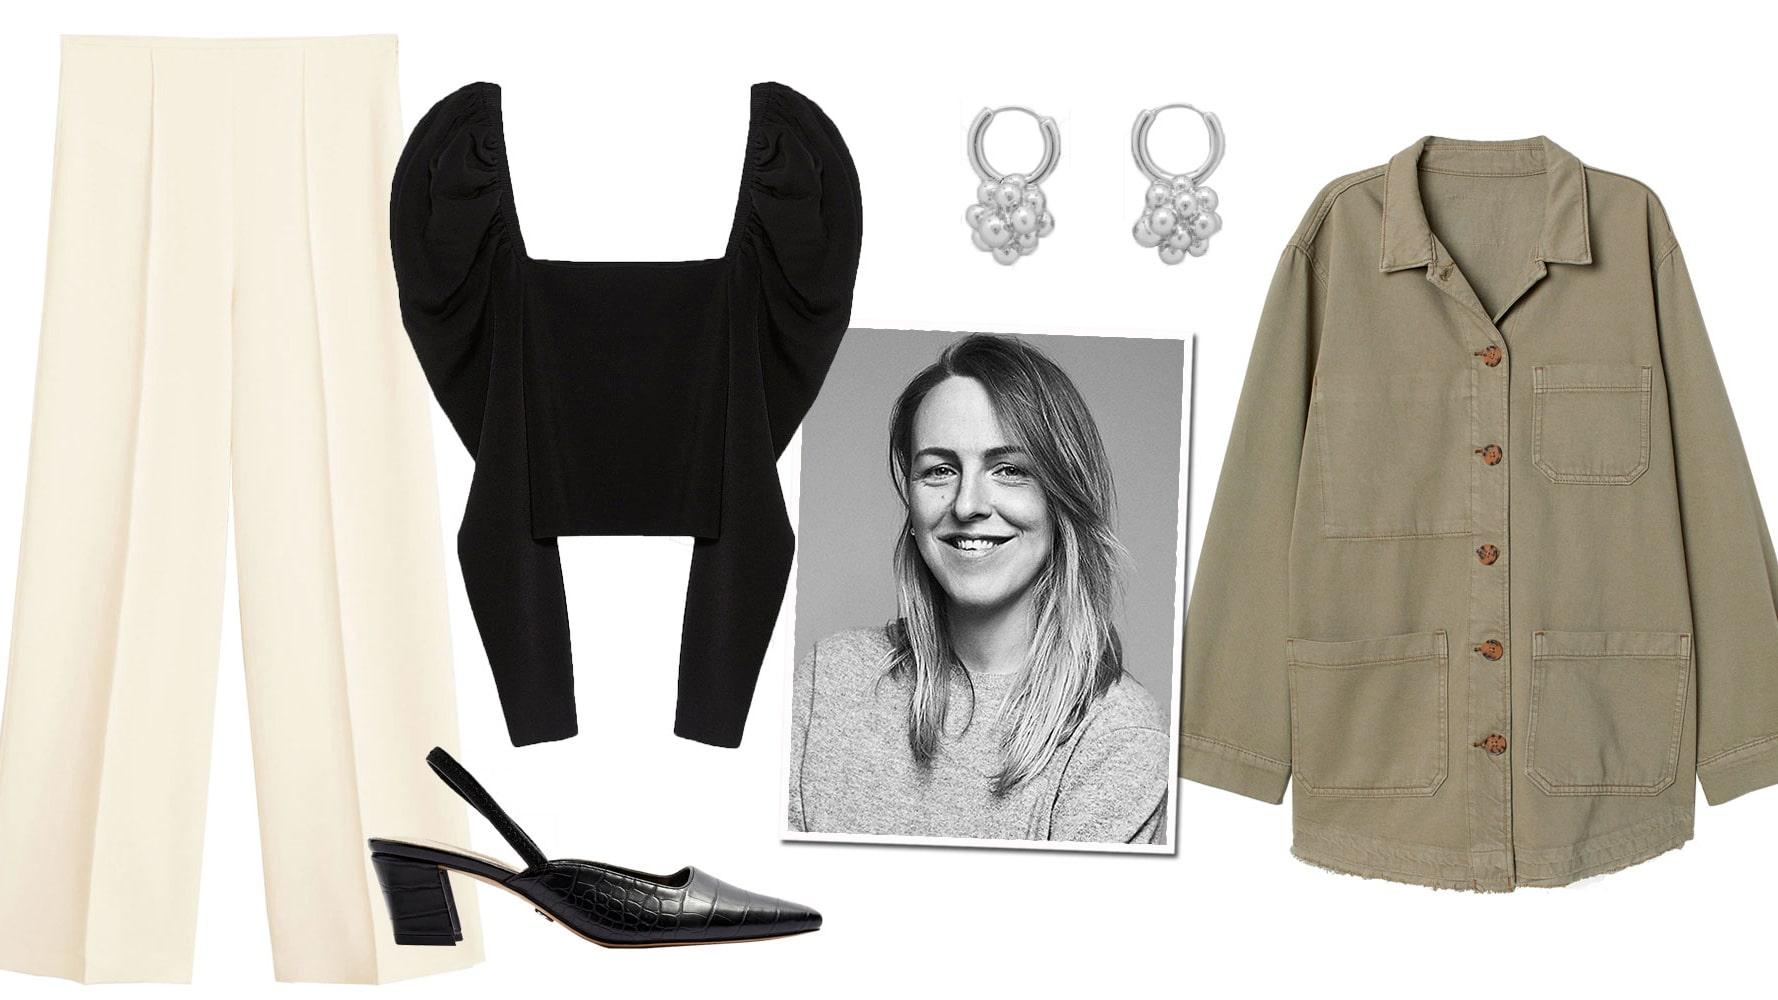 Chefredaktör Jonna Berghs fem favoriter – under 500 kronor